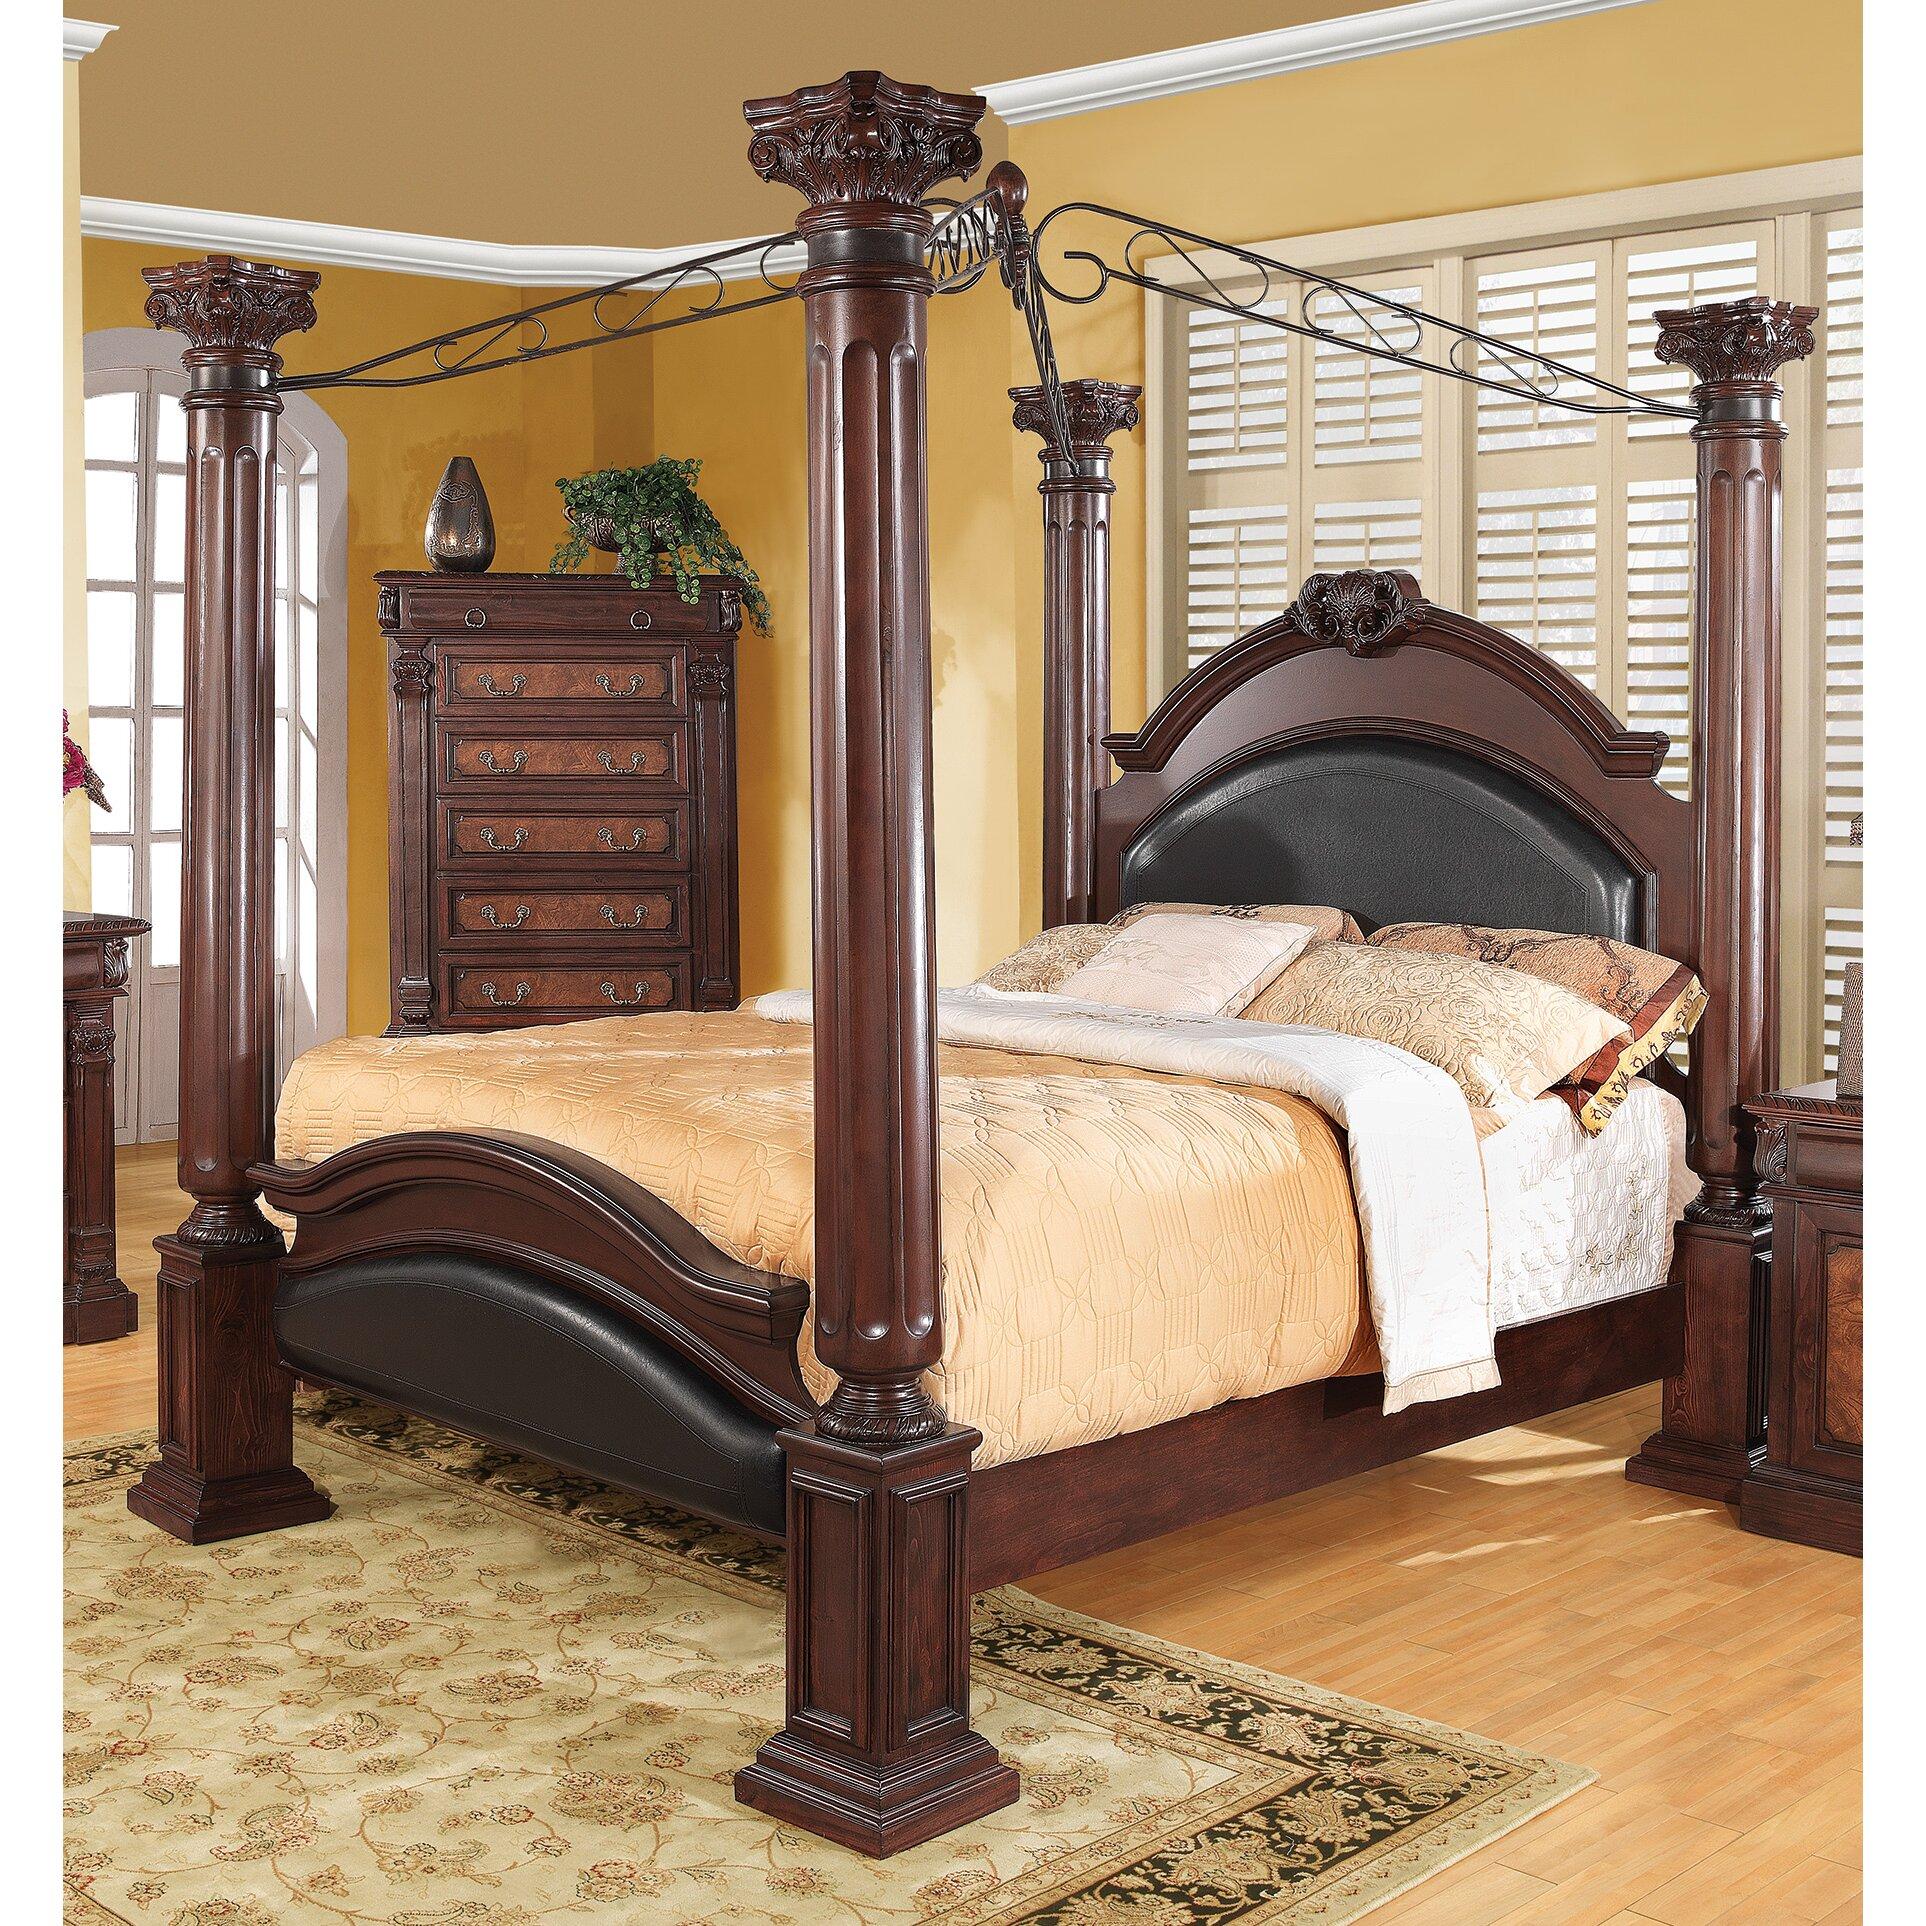 Canopy Beds You'll Love | Wayfair - Fechteler Upholstered Canopy Bed